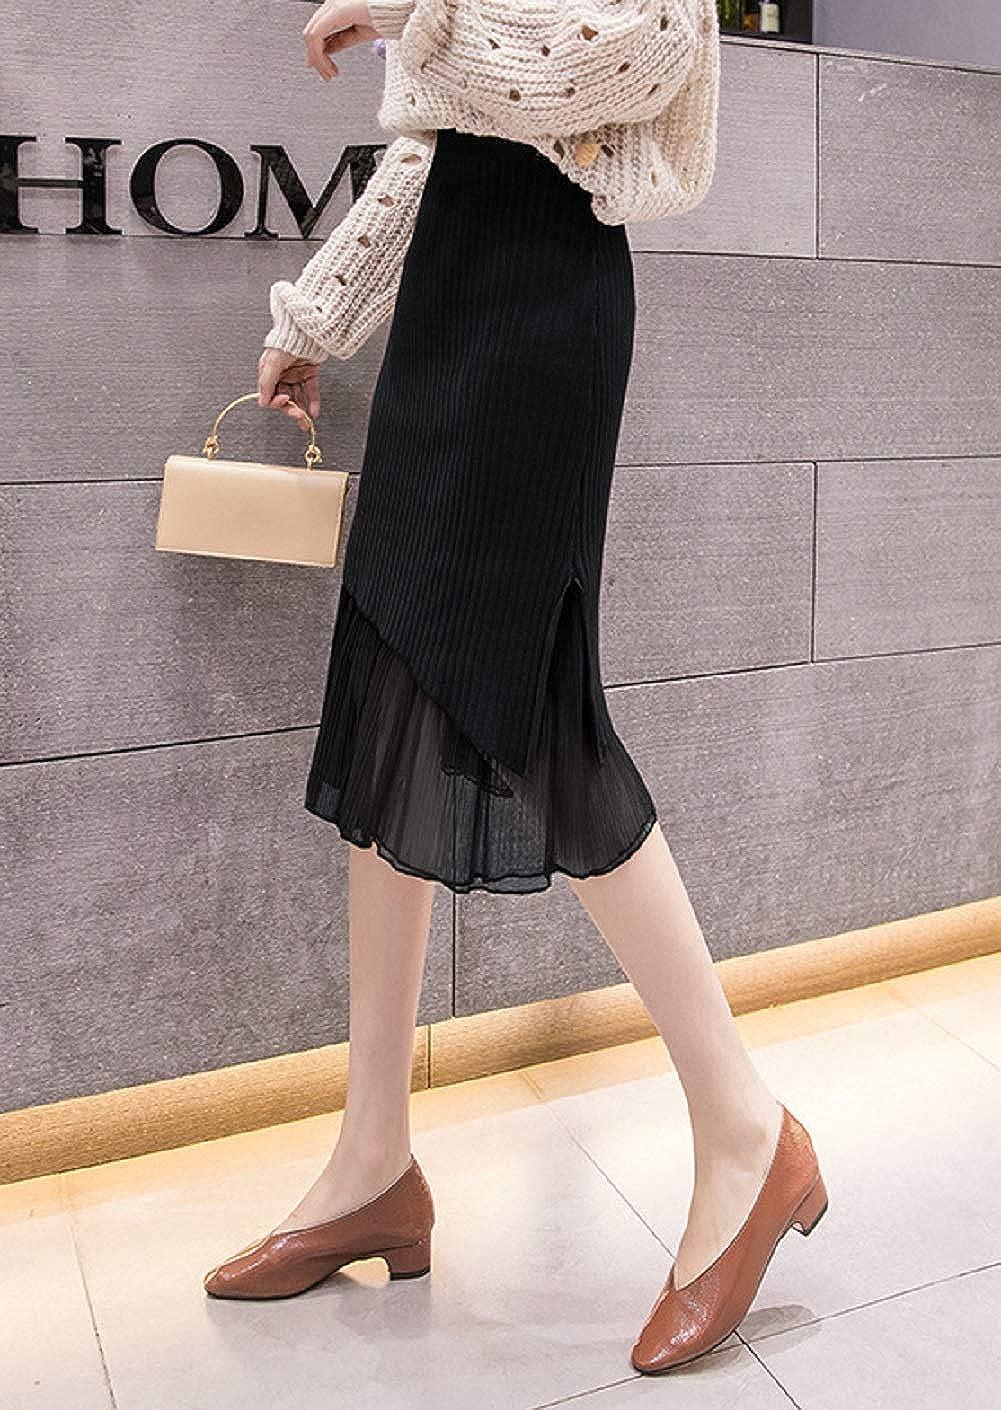 CHARTOU Women's High Waist Package Hip Flounce Mesh Knitted Midi Pencil Skirt